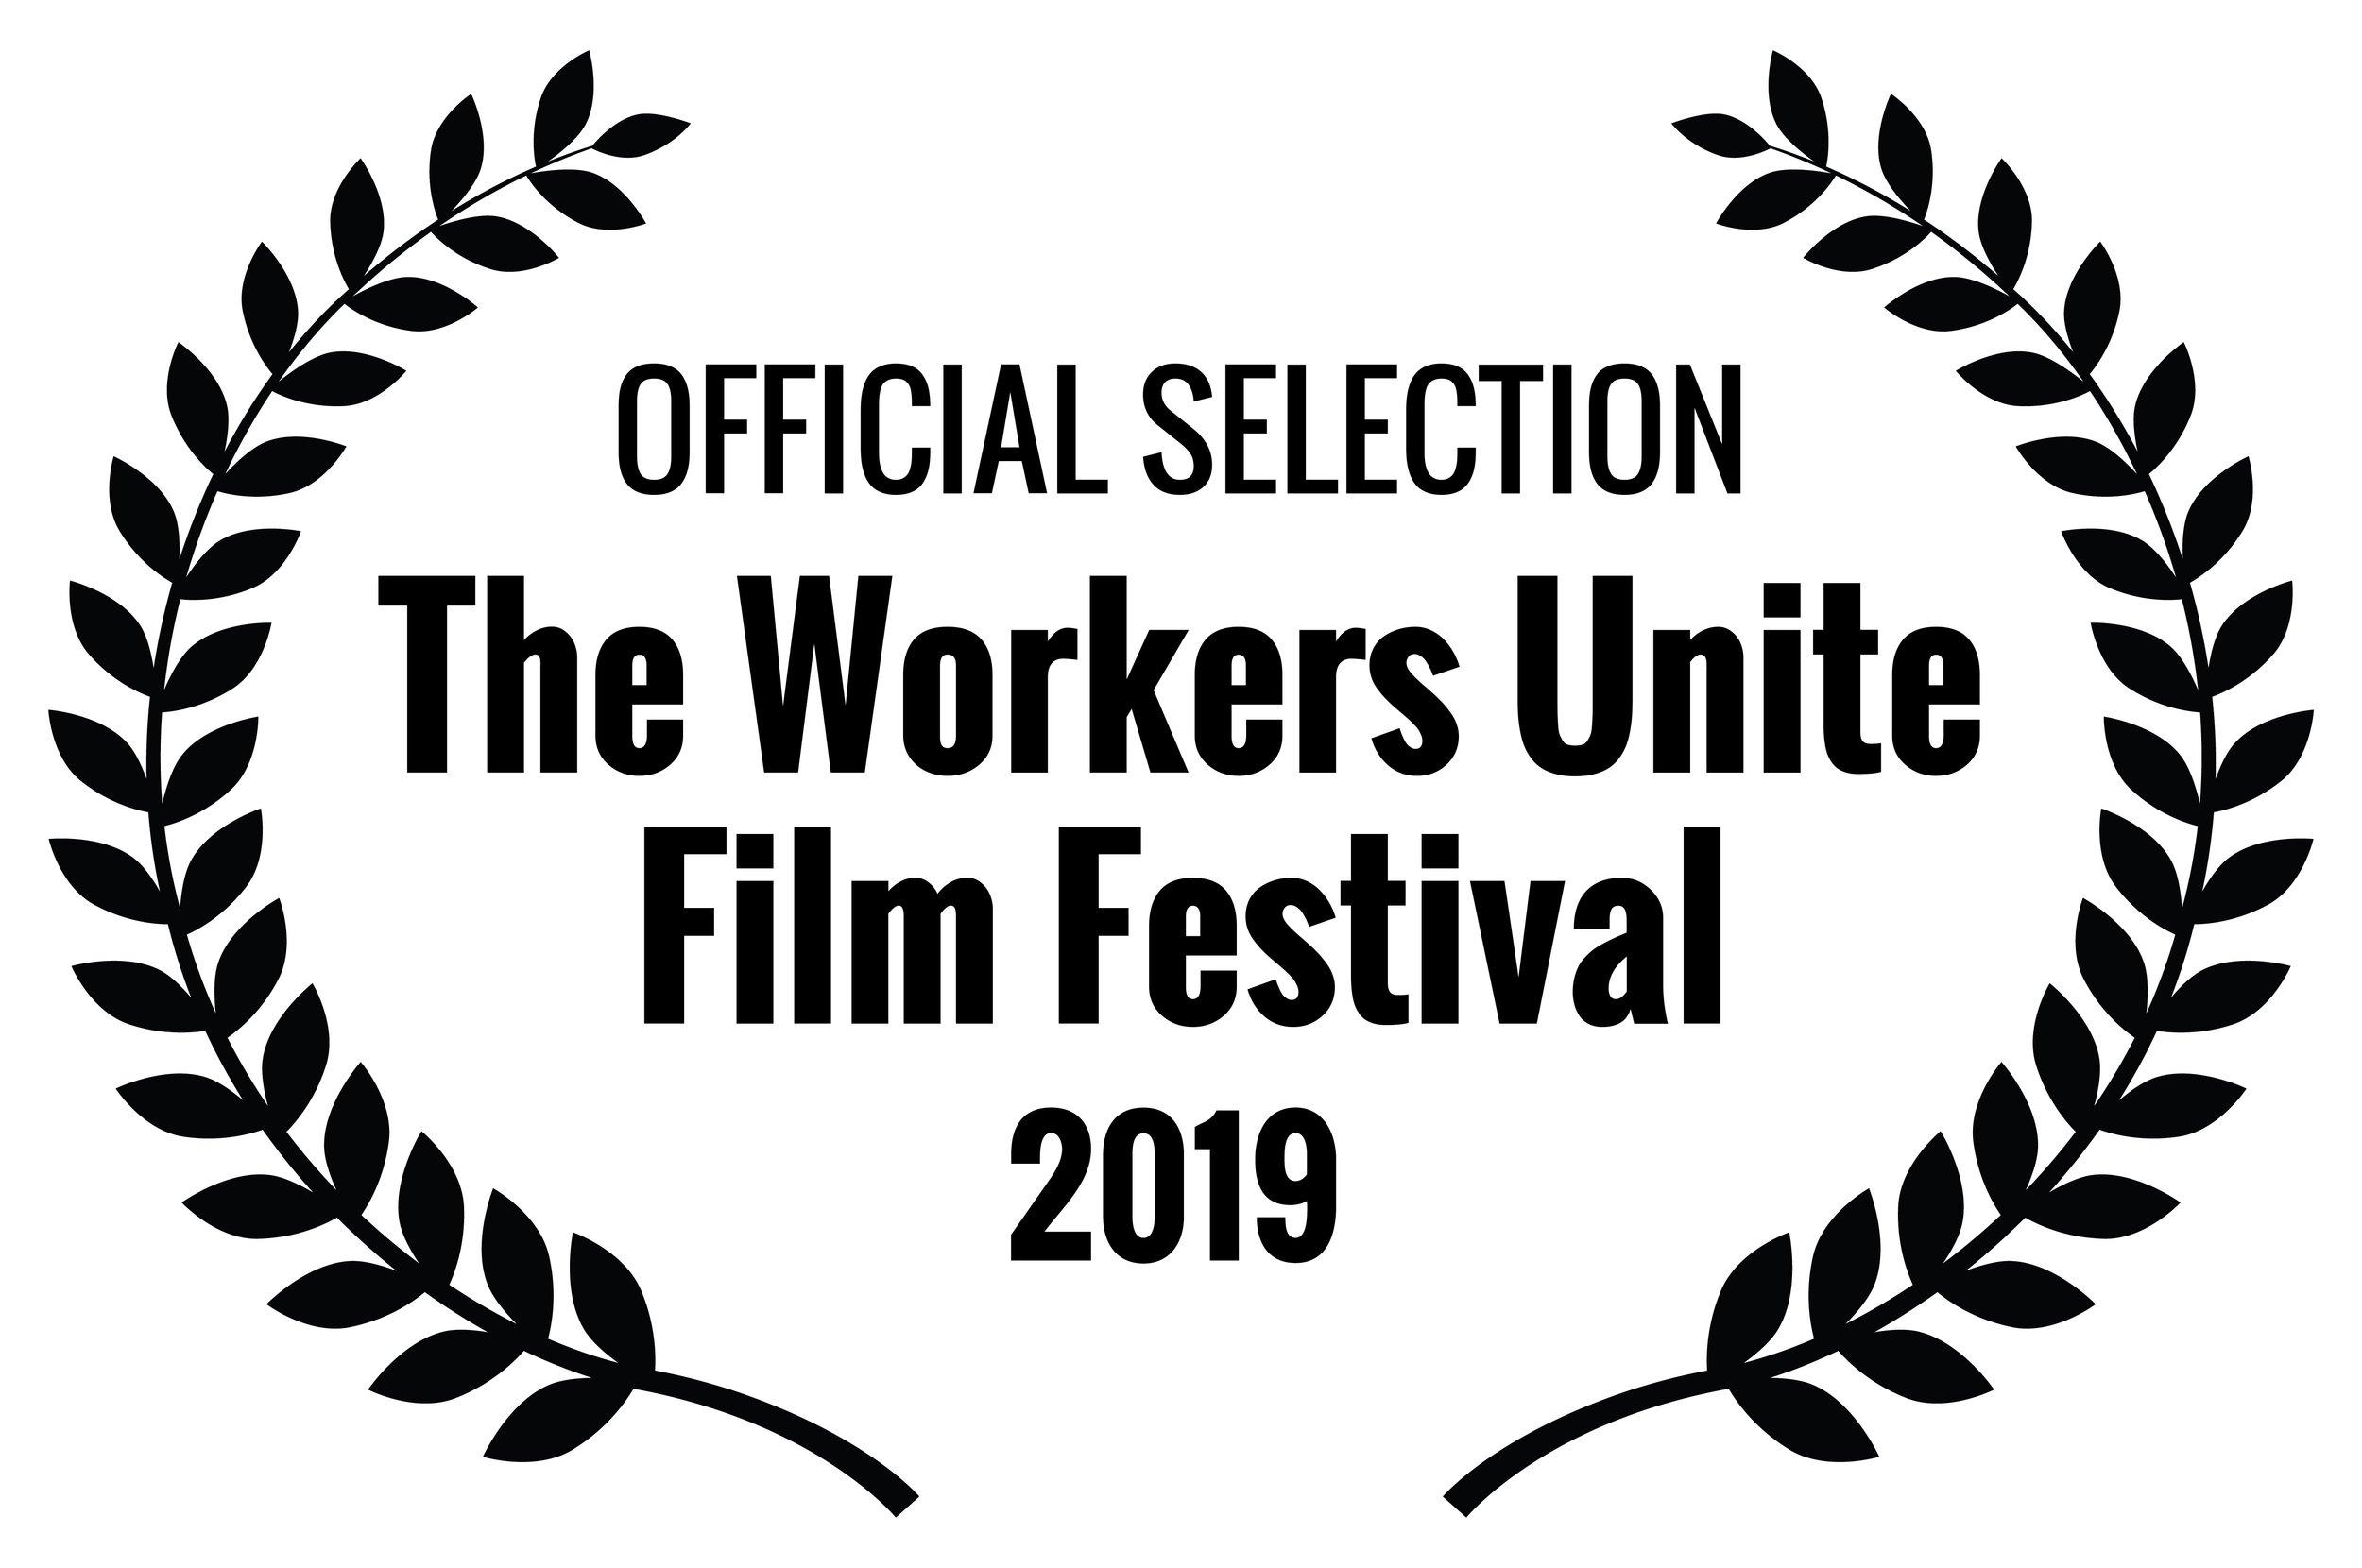 OFFICIALSELECTION-TheWorkersUniteFilmFestival-2019.jpg